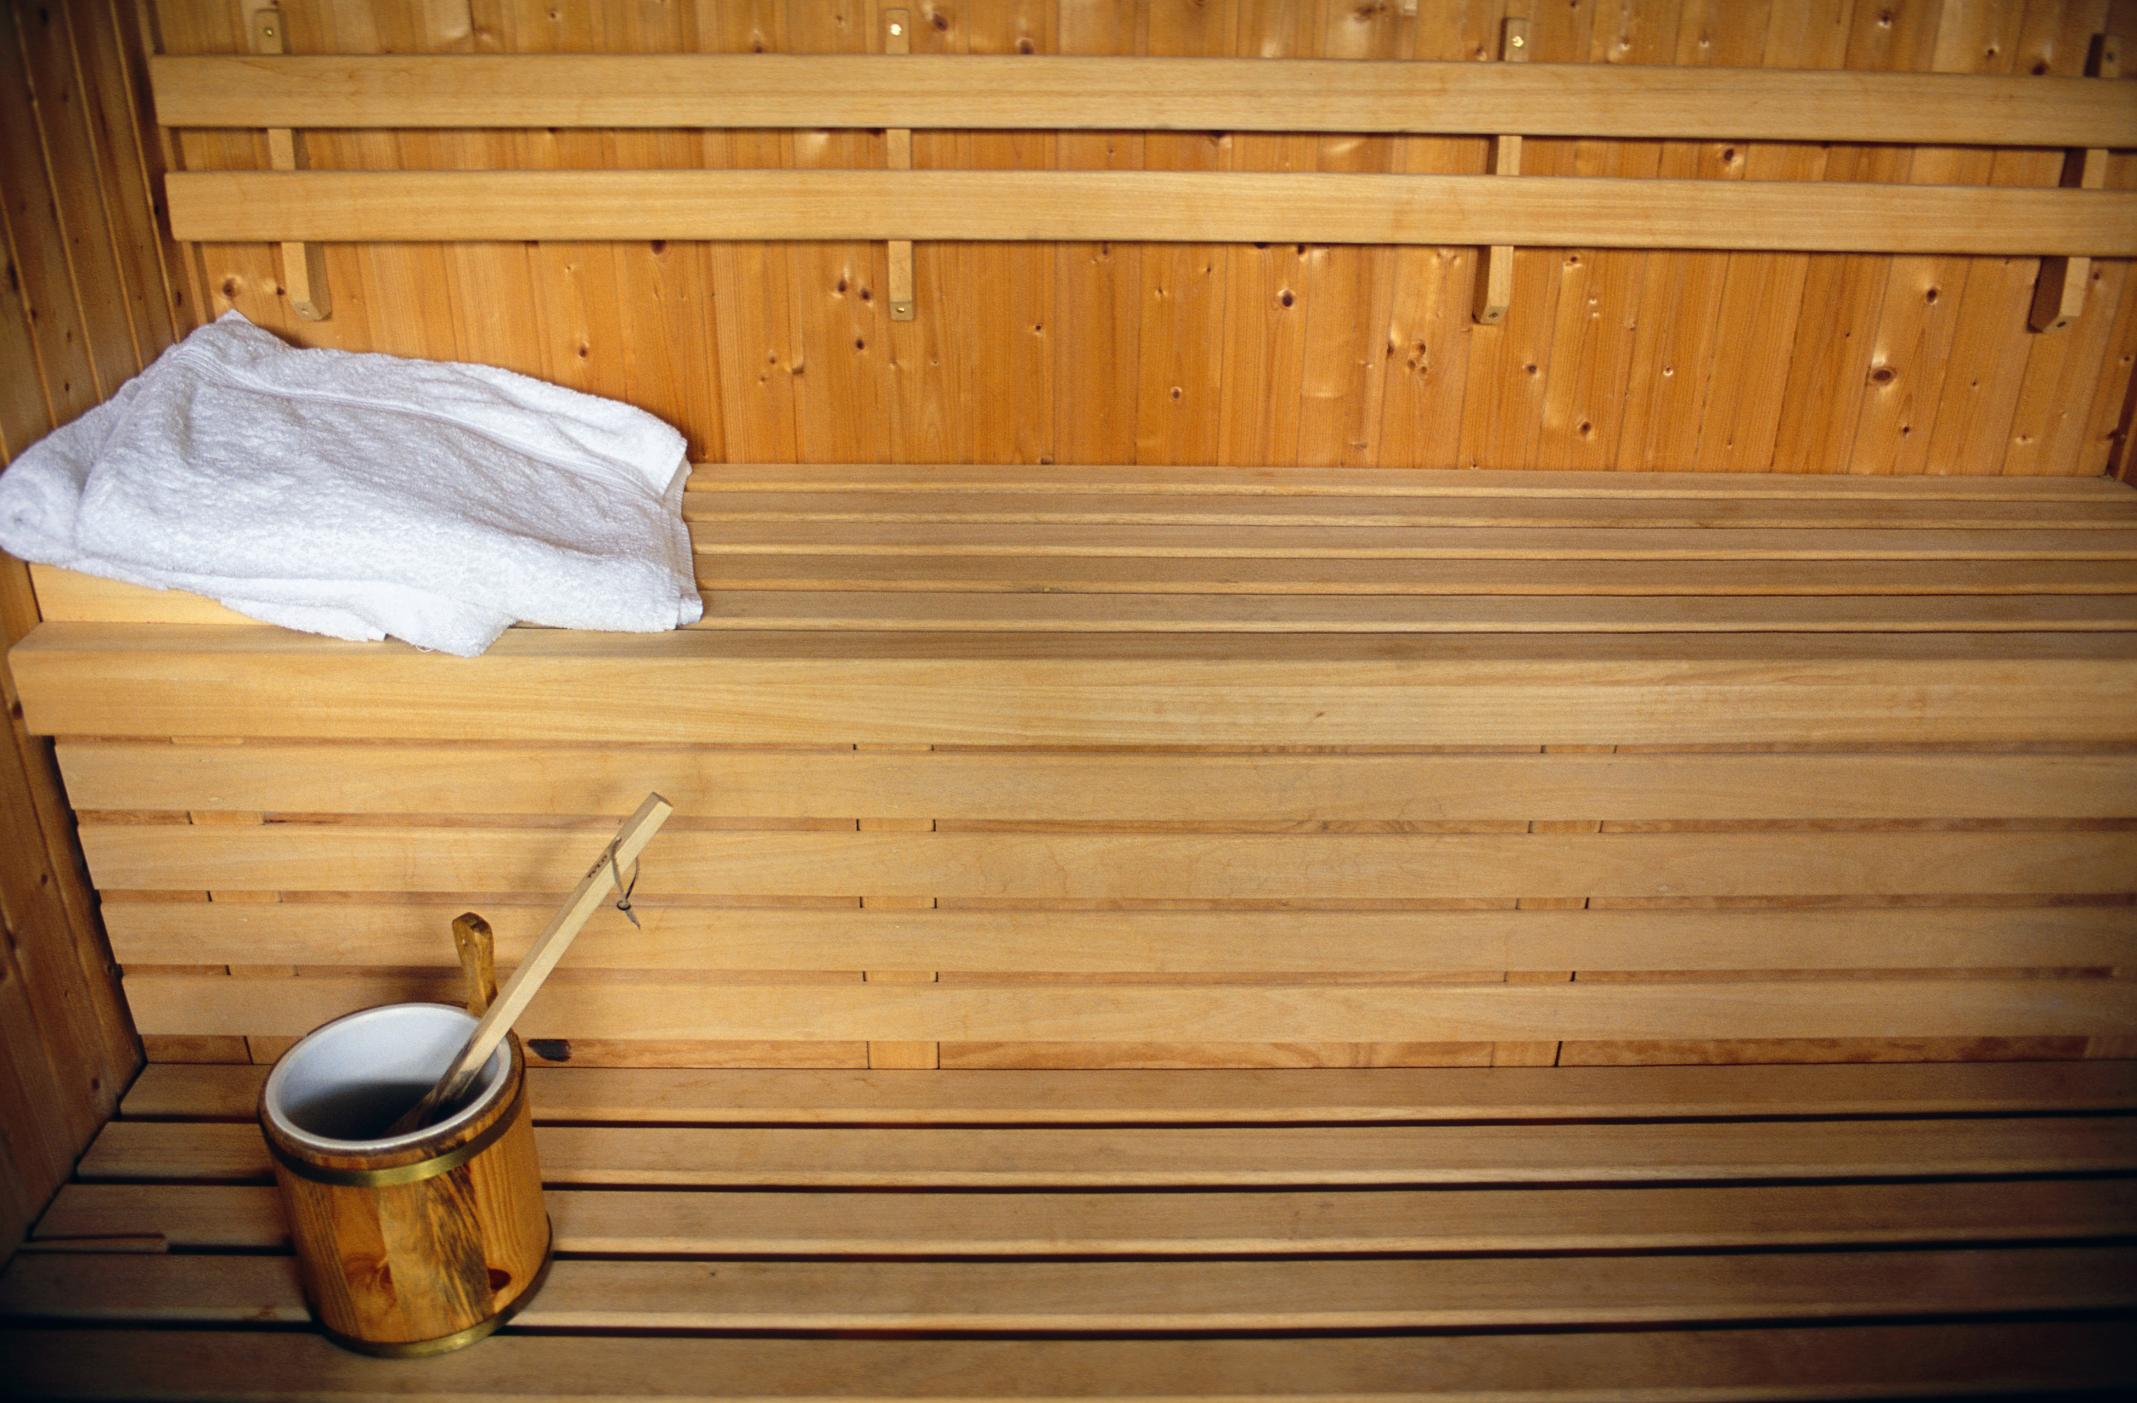 How To Turn A Bathroom Into A Sauna | LEAFtv